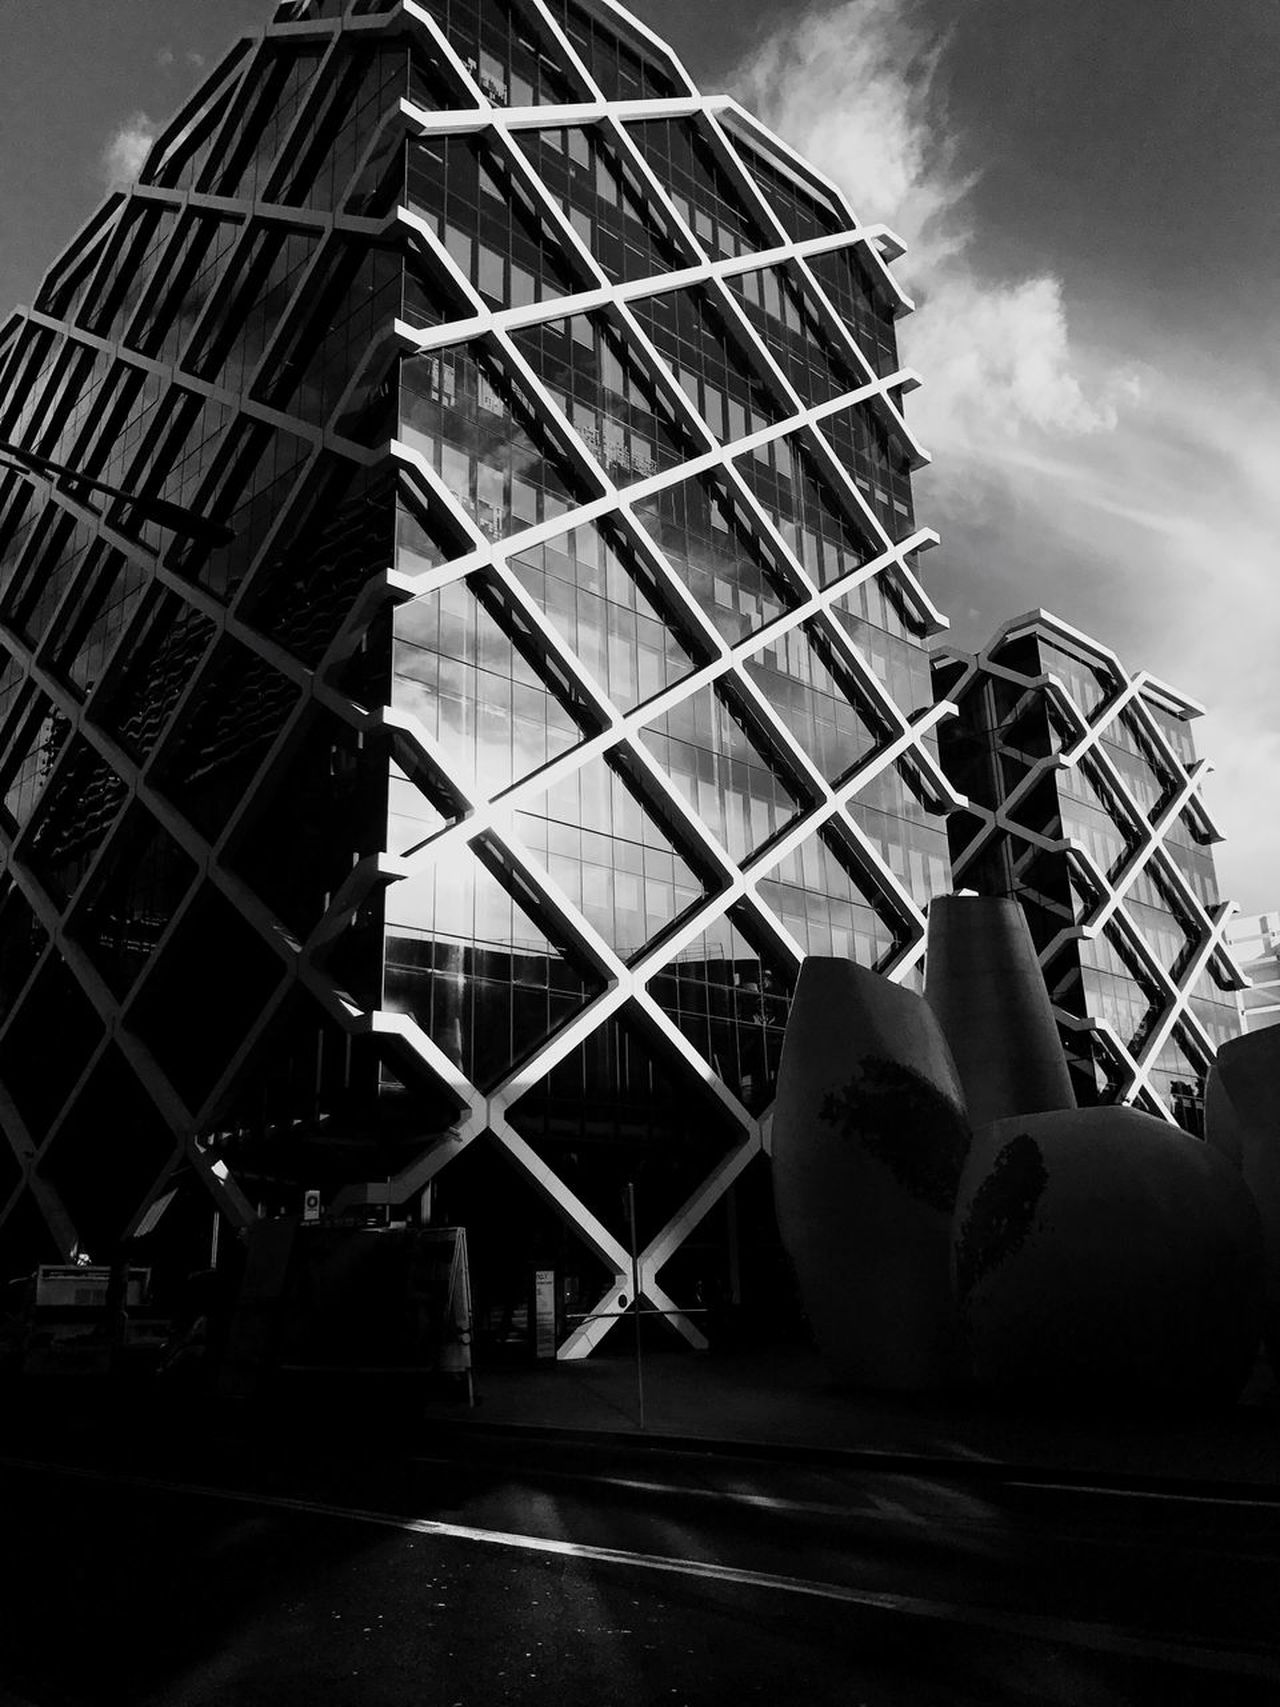 Black And White Architecture The Architect - 2017 EyeEm Awards